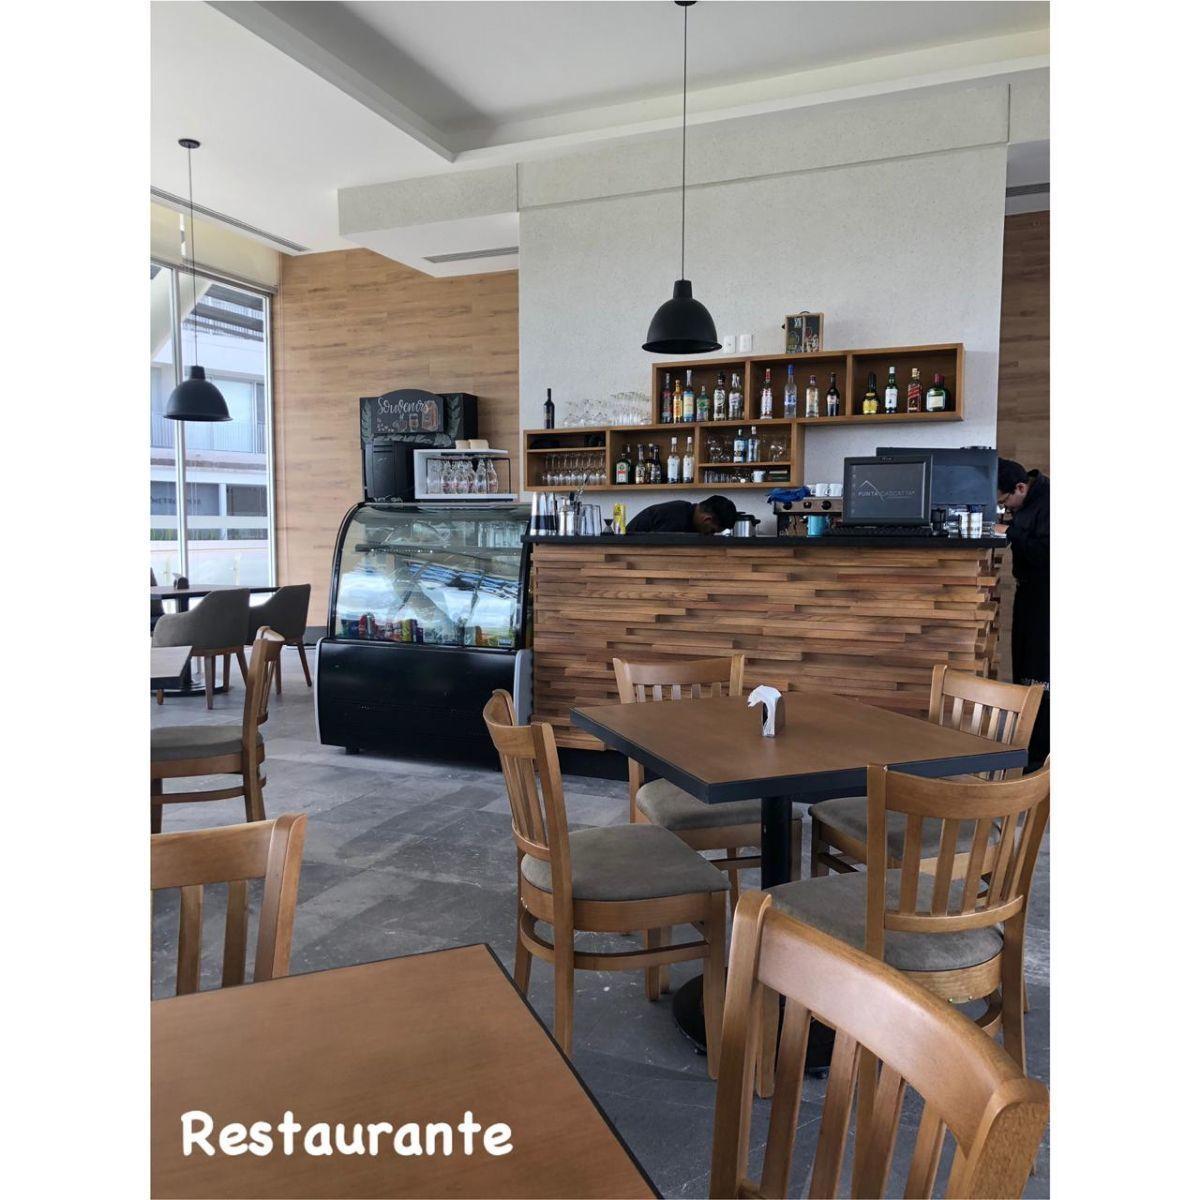 13 de 16: Restaurante